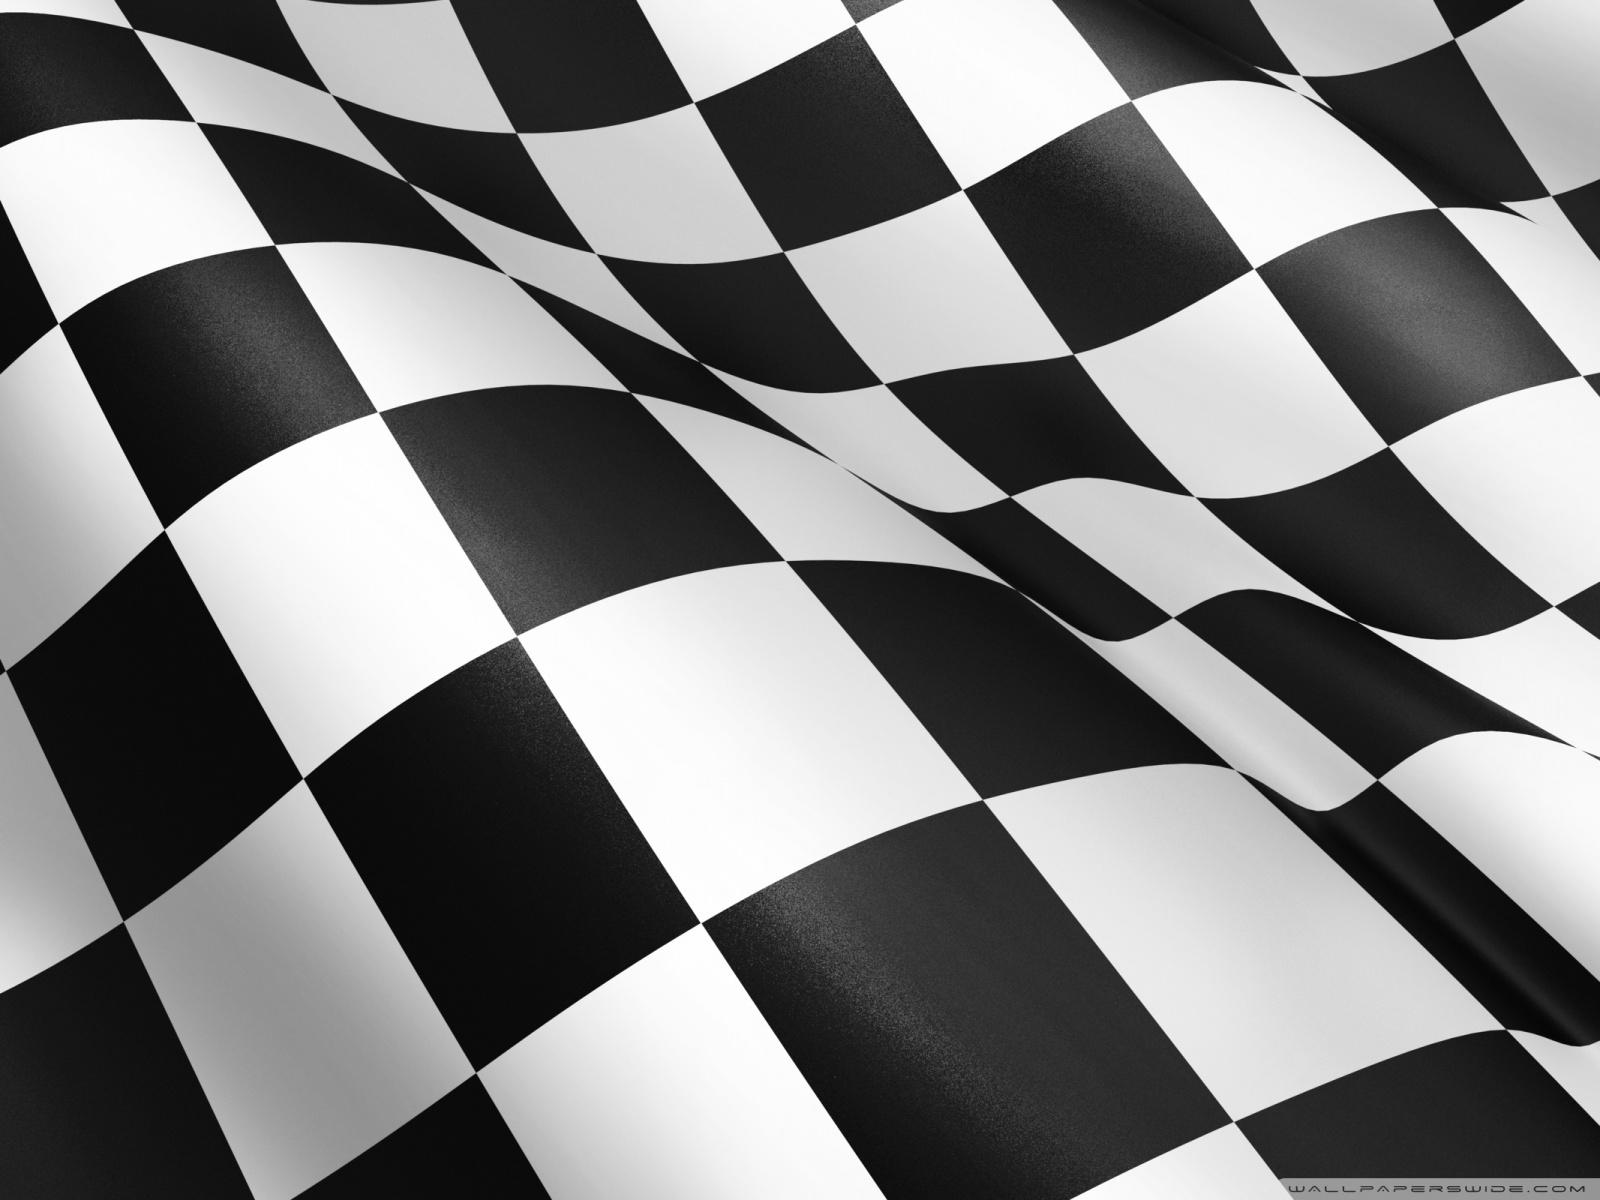 Free Racing flag phone wallpaper by ayman